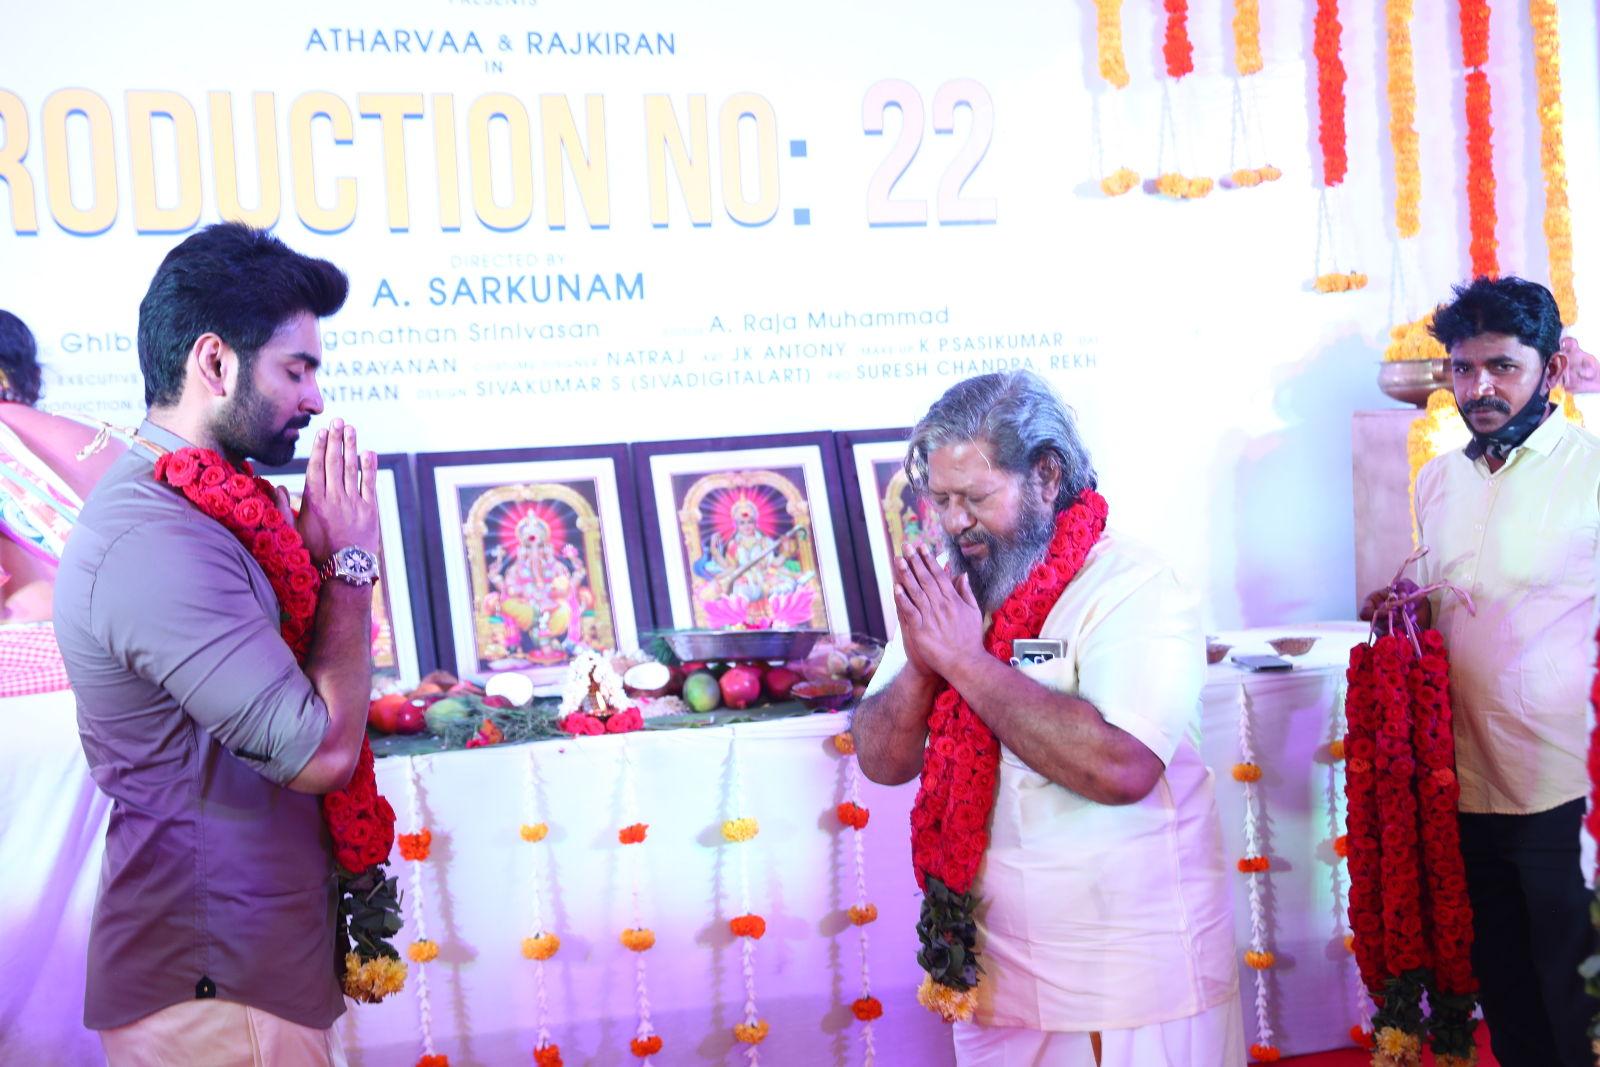 Lyca Productions No 22 Atharvaa Murali Rajkiran Sarkunam Film launched